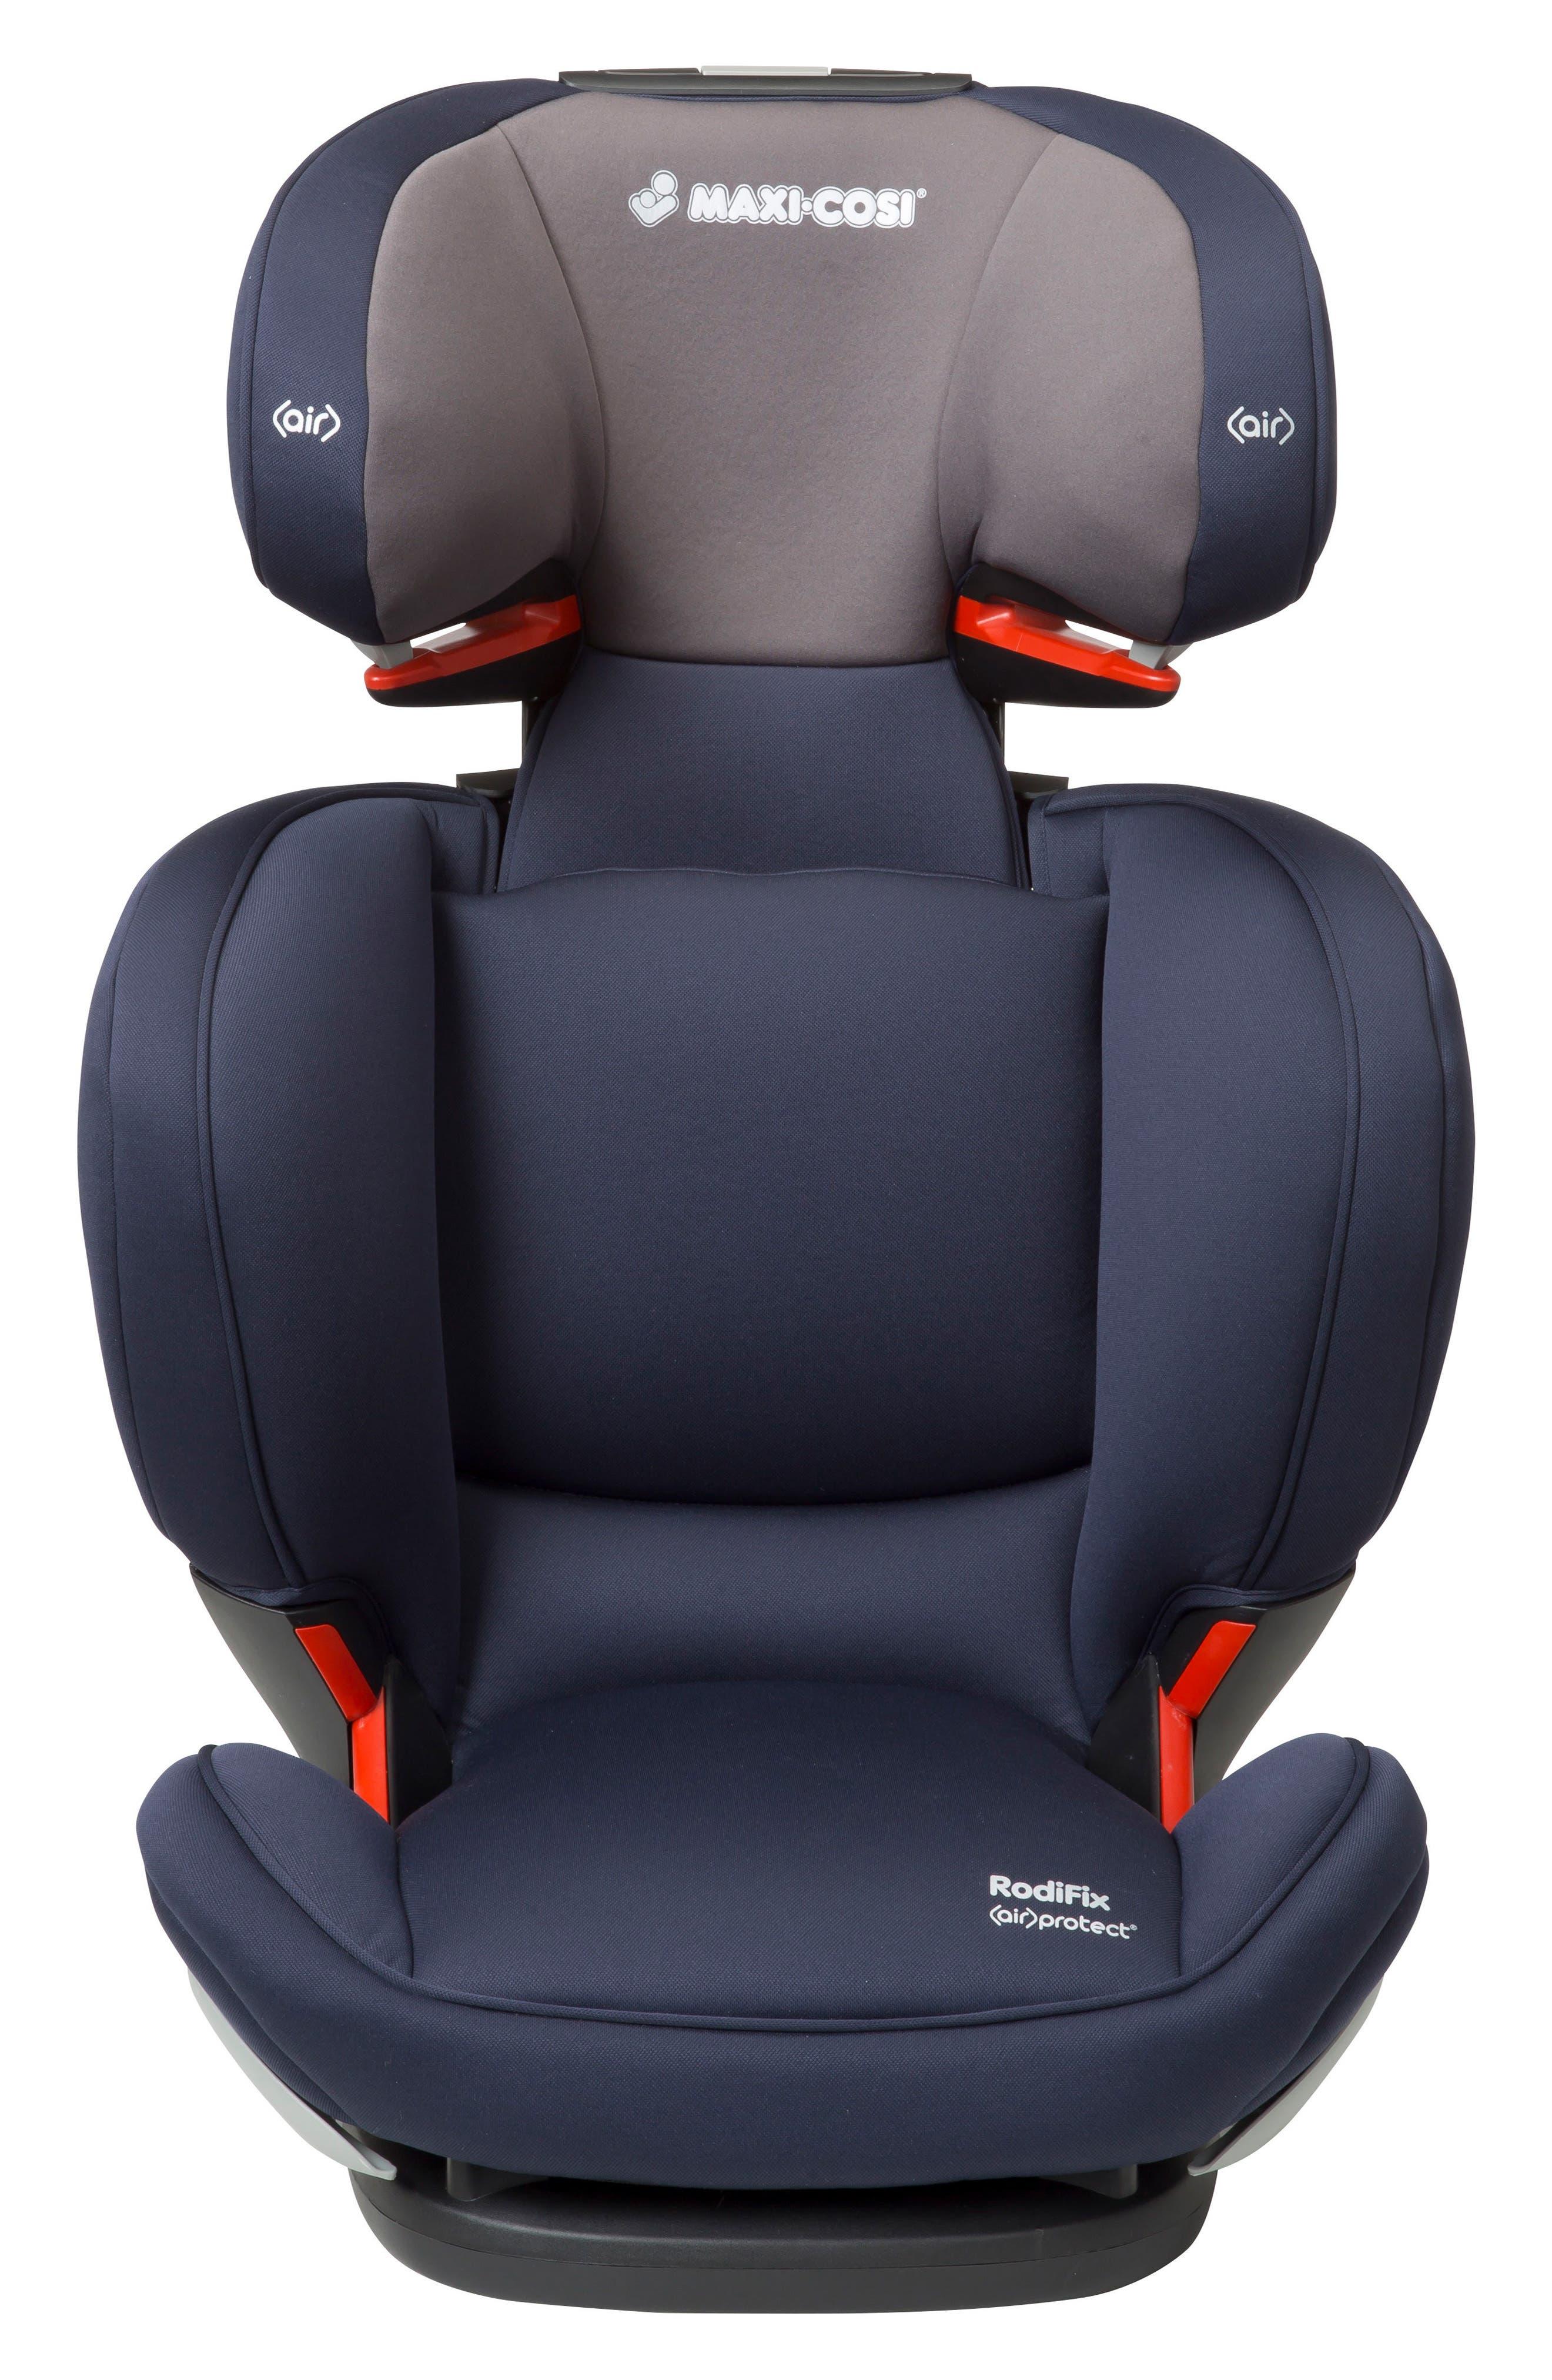 RodiFix Booster Car Seat,                             Main thumbnail 1, color,                             413